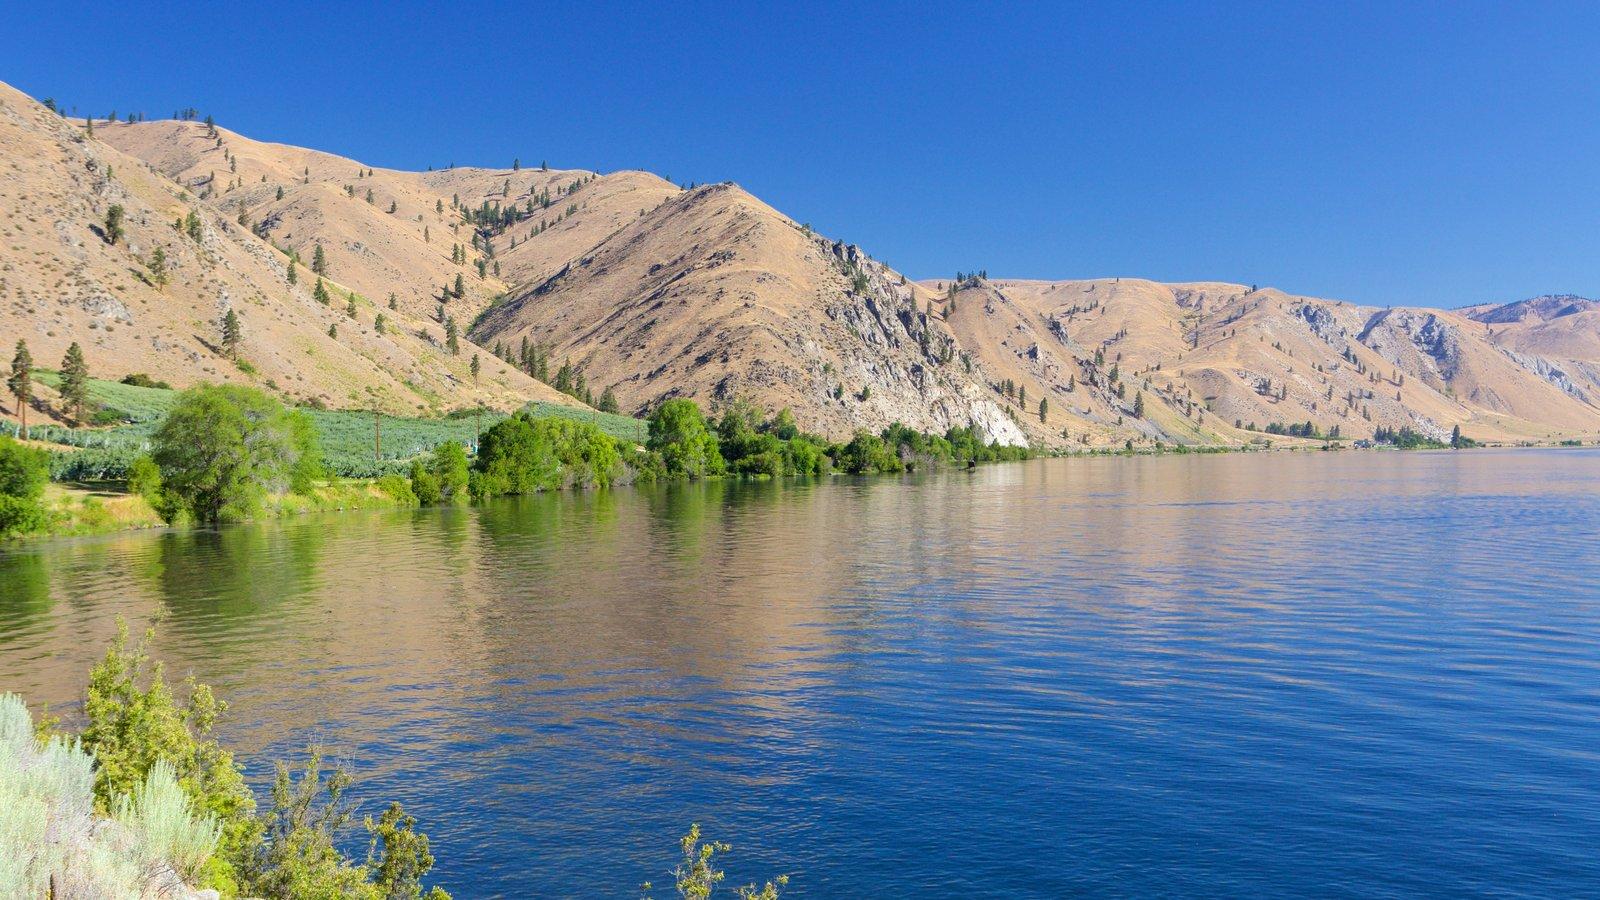 Wenatchee - Lake Chelan mostrando um lago ou charco e montanhas